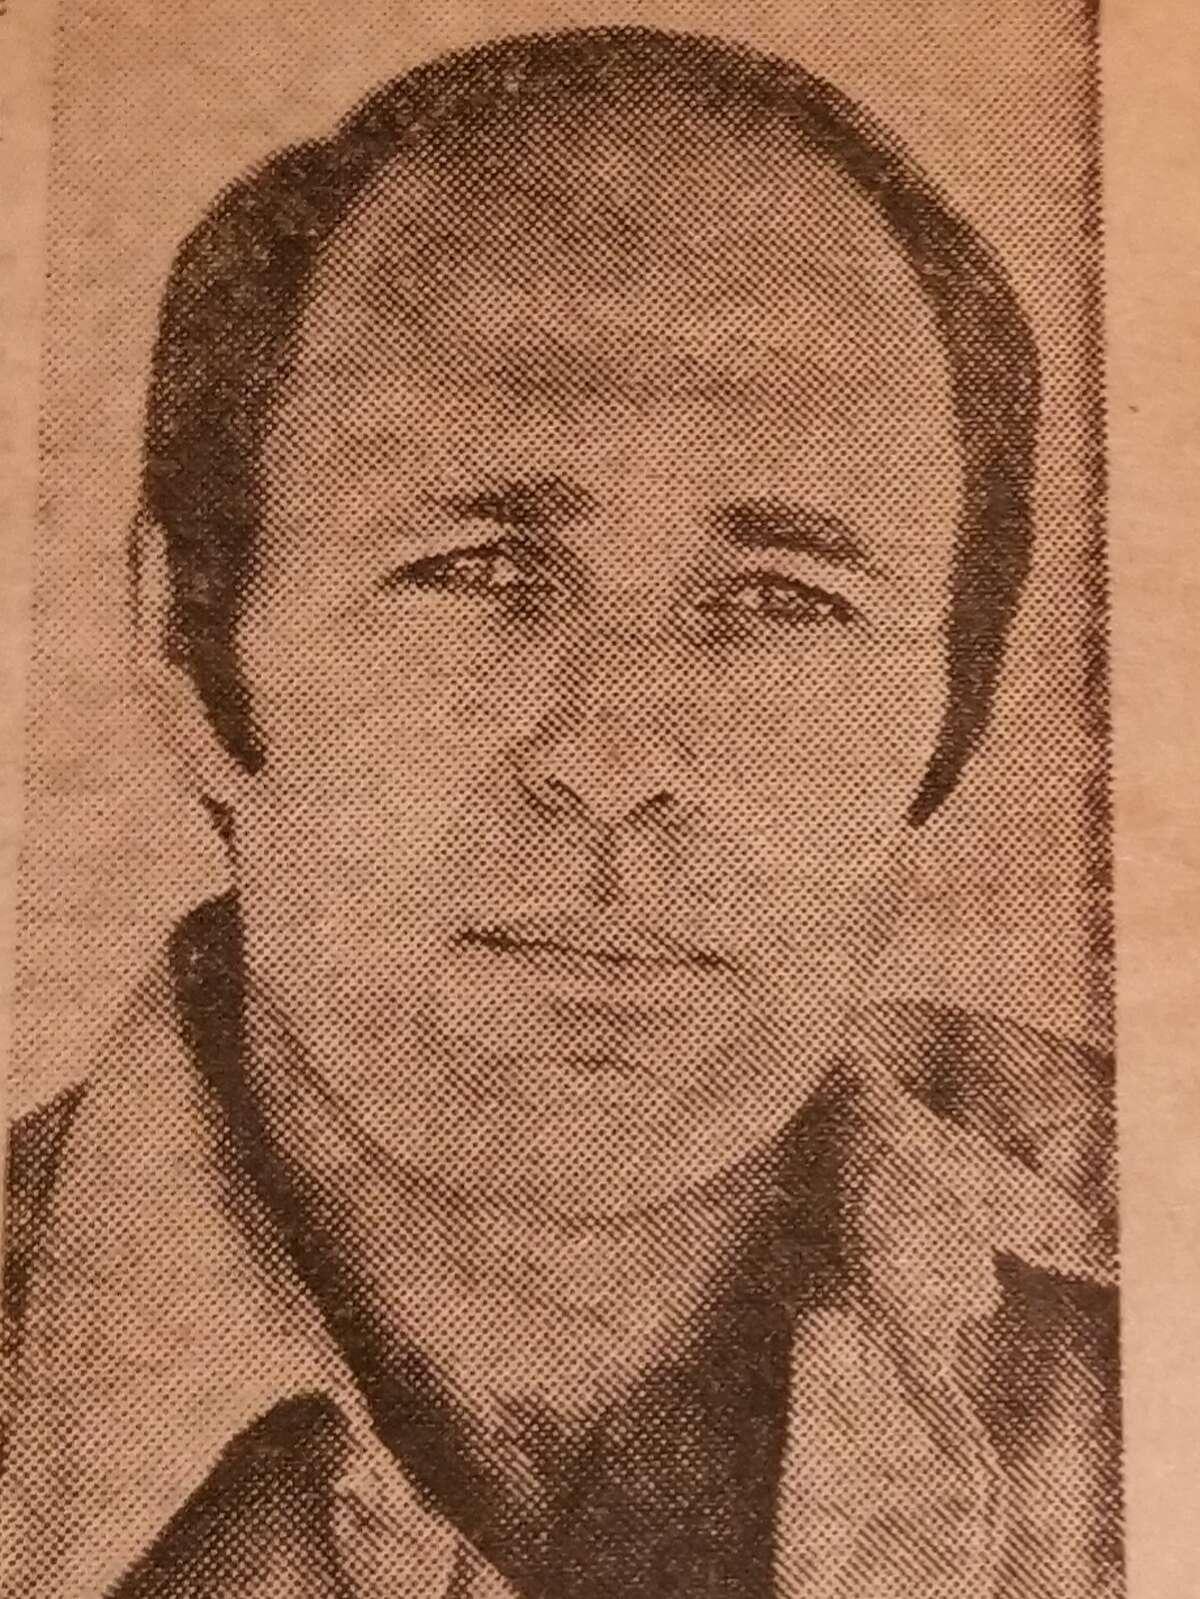 Actor-director Peter Masterson, circa 1988